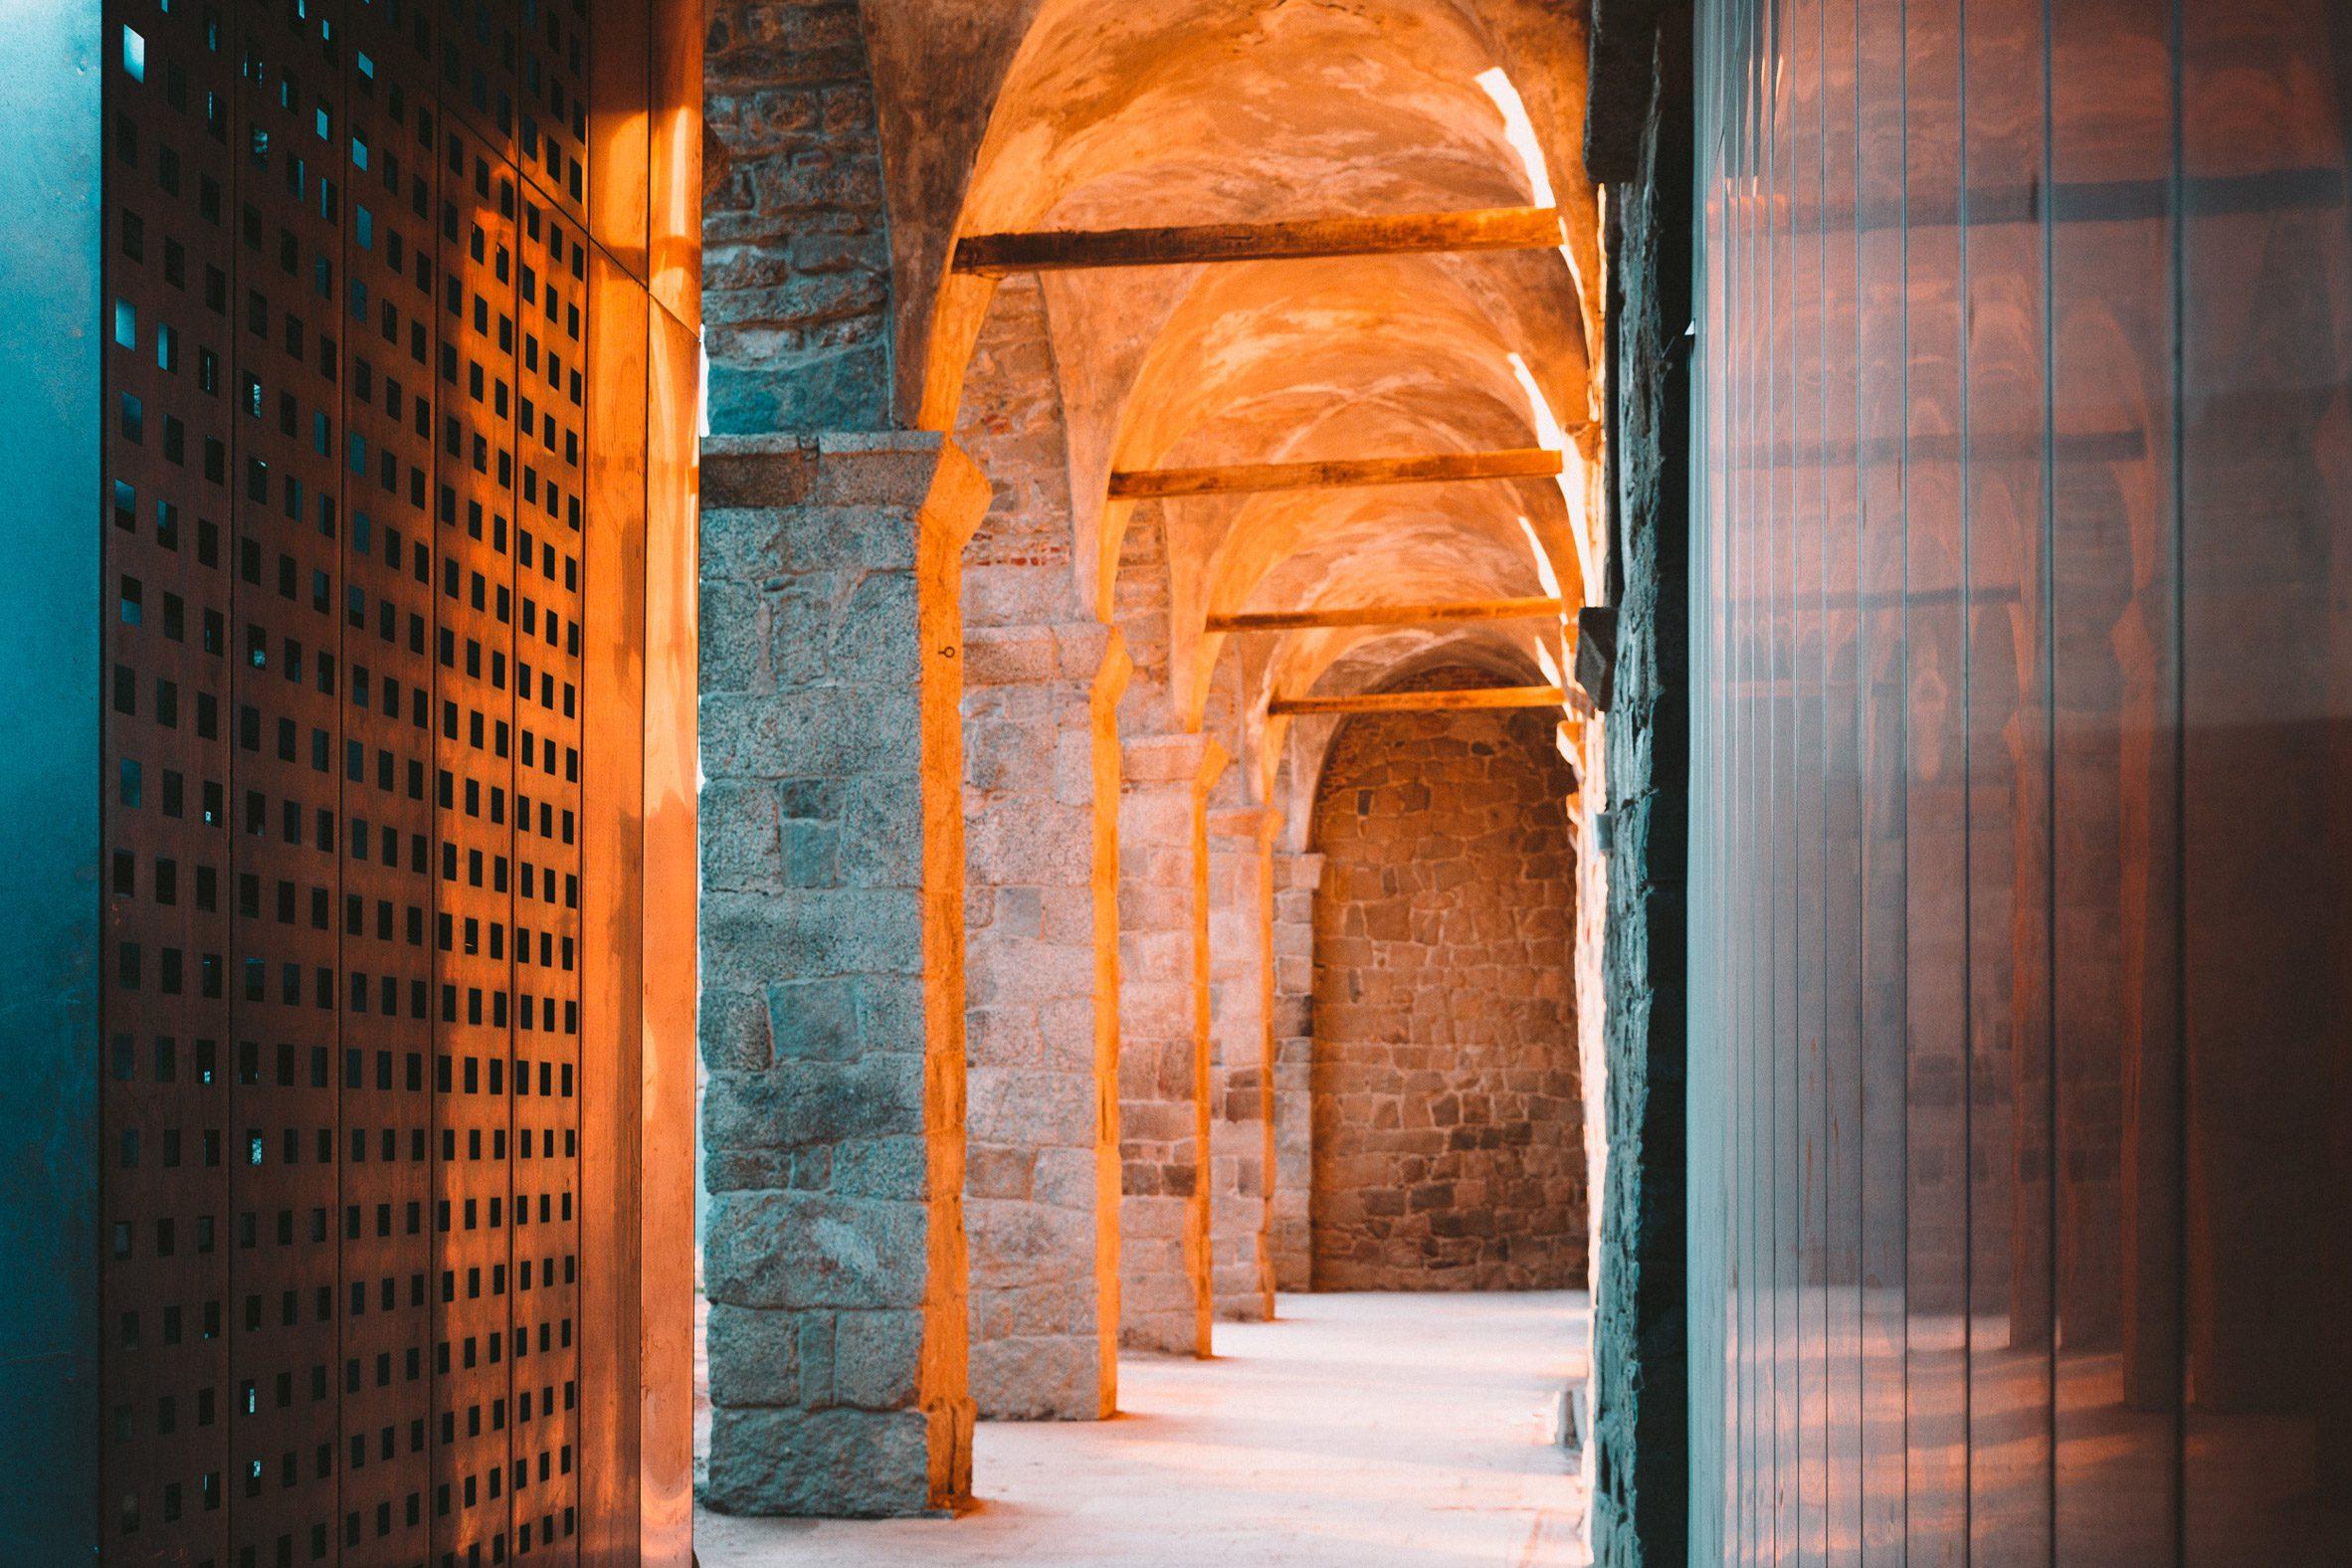 The interior glows a copper hue